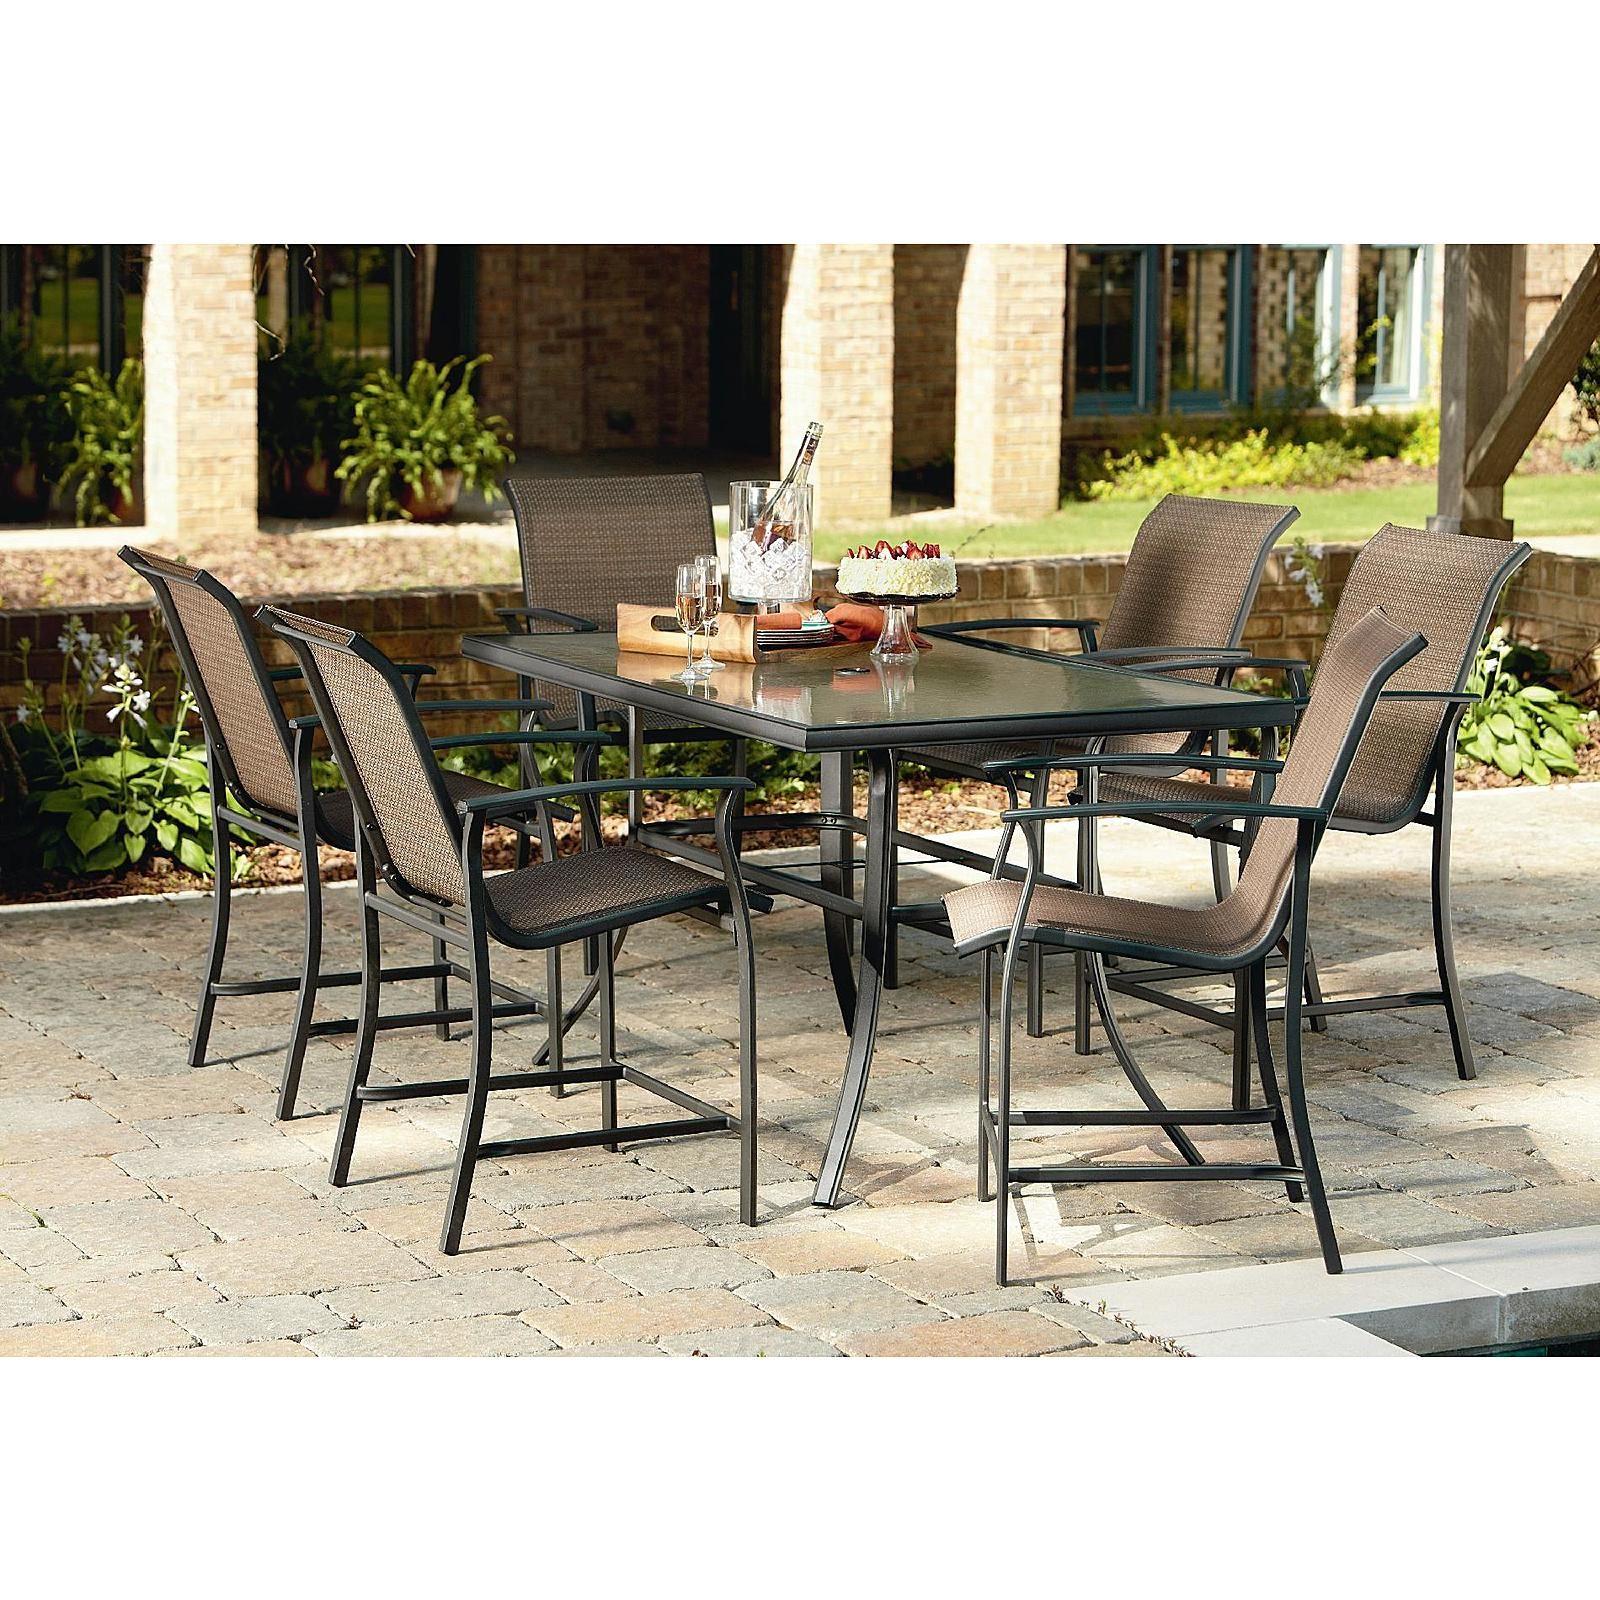 Garden Oasis Harrison 8 Piece Sling High Dining Set - Outdoor